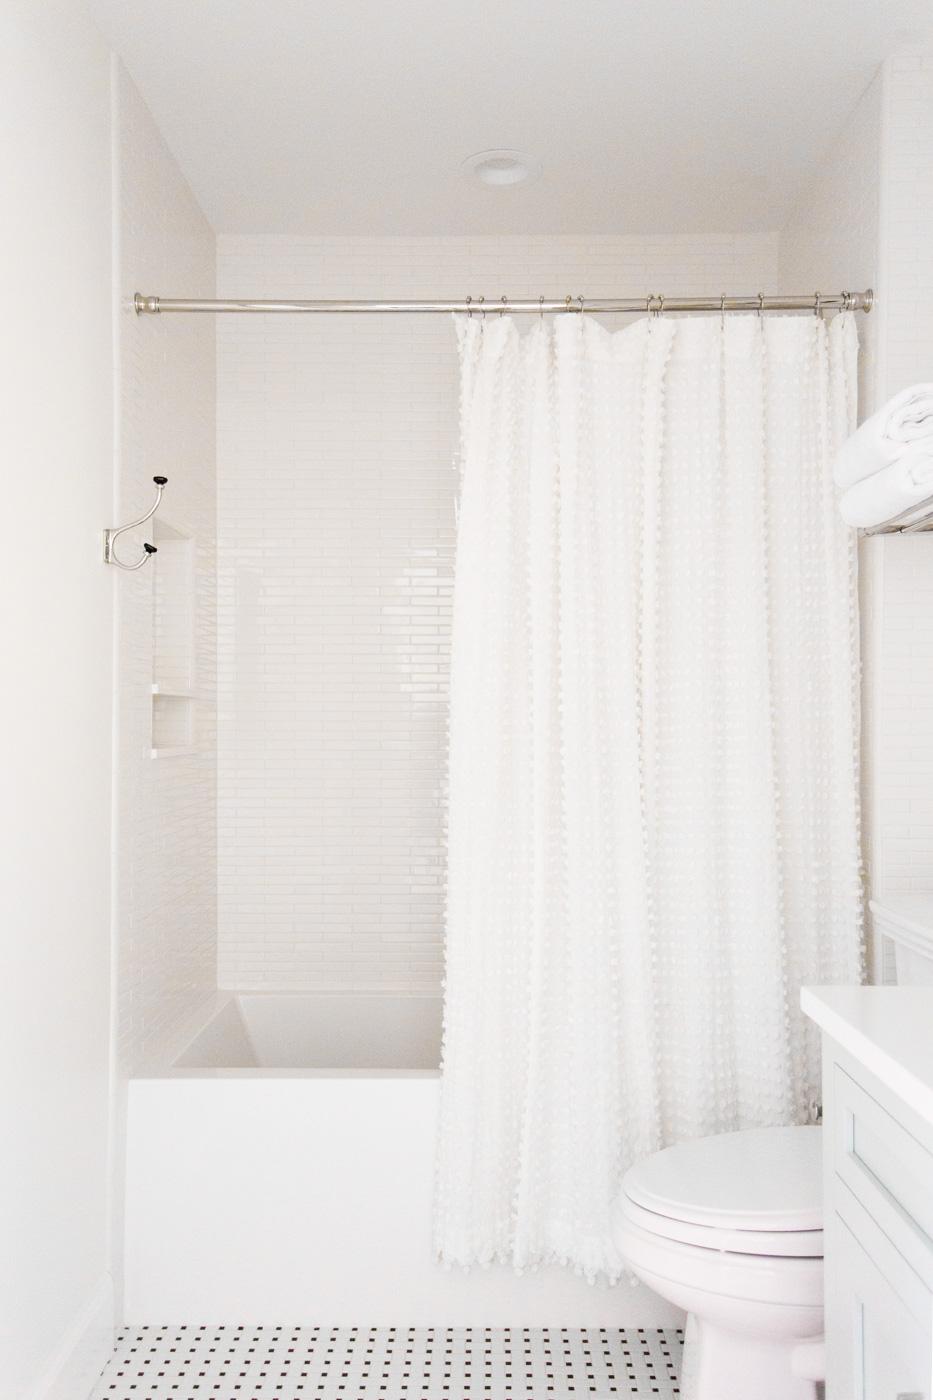 White bathtub with white shower curtain